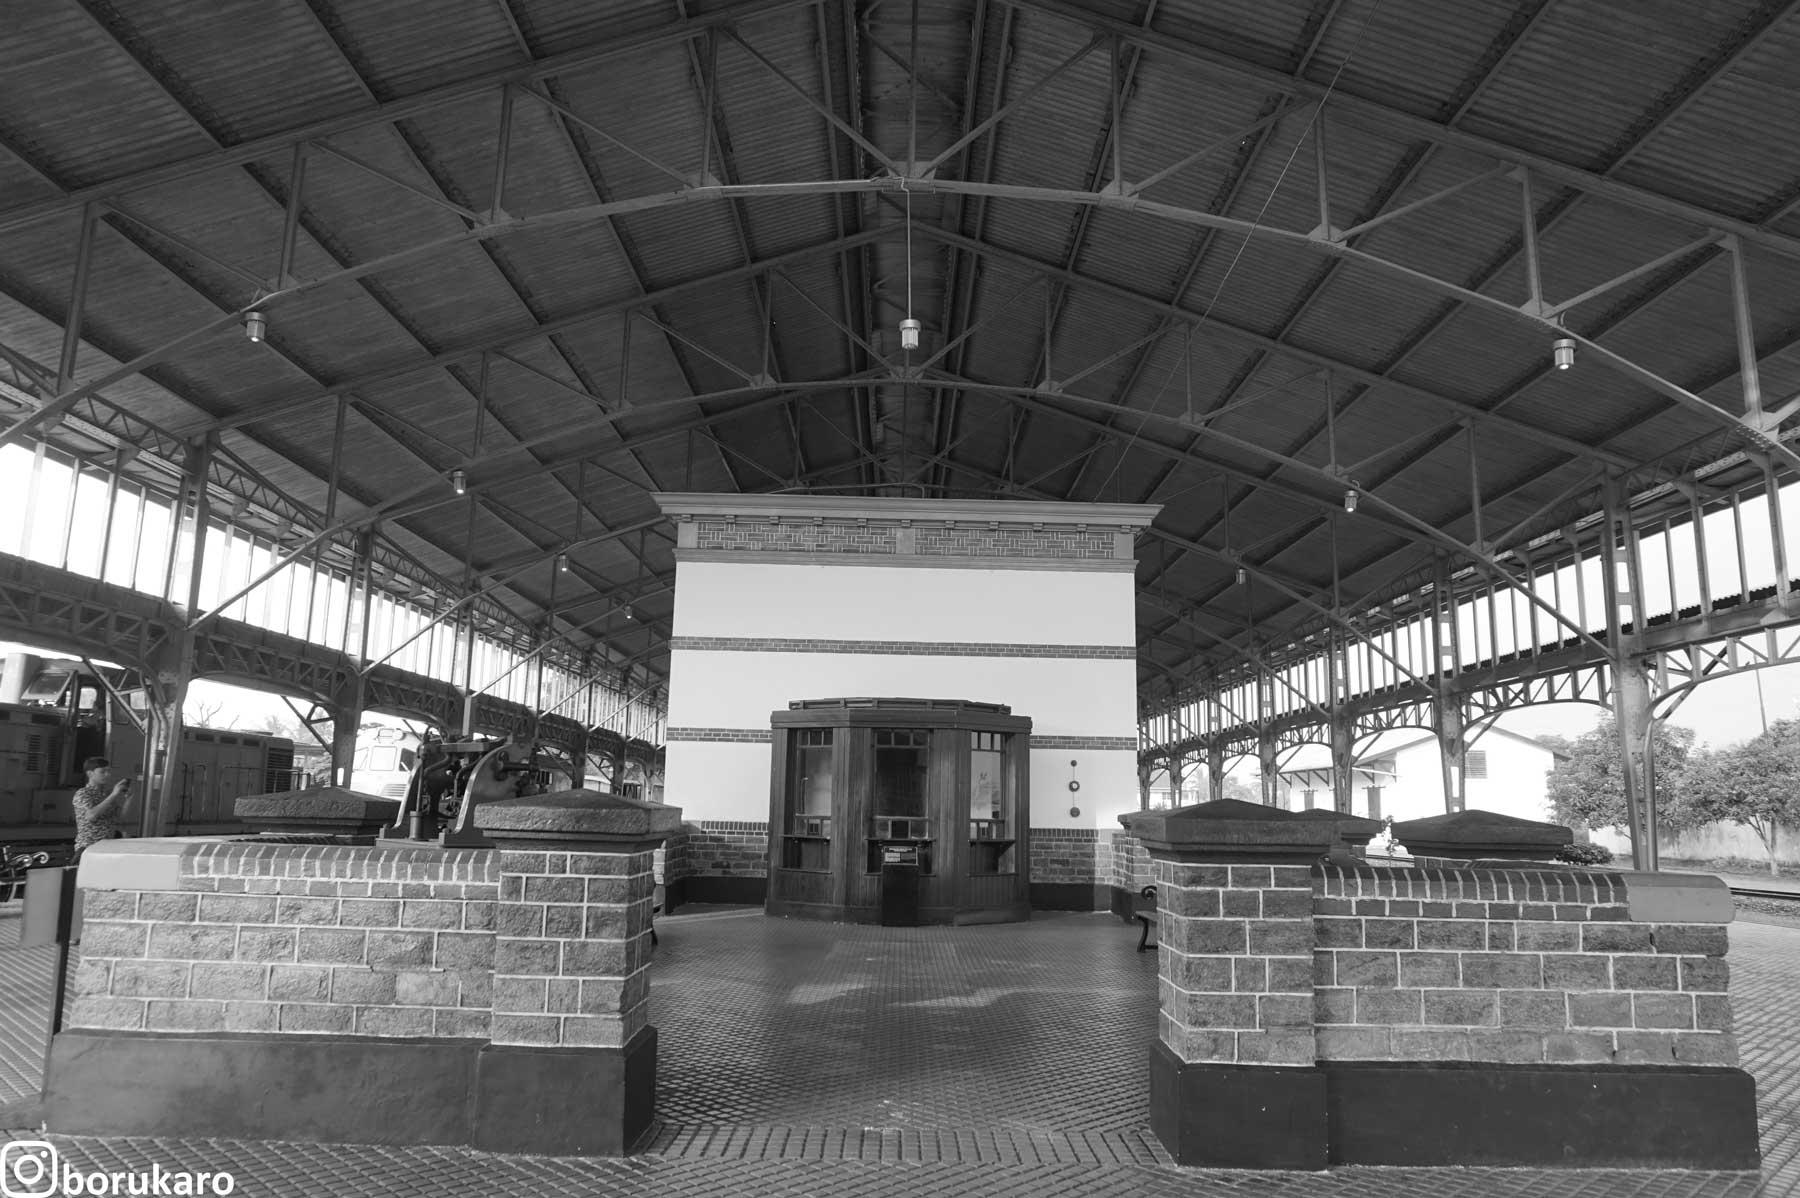 museum-kereta-api-ambarawa11-borukaro-com